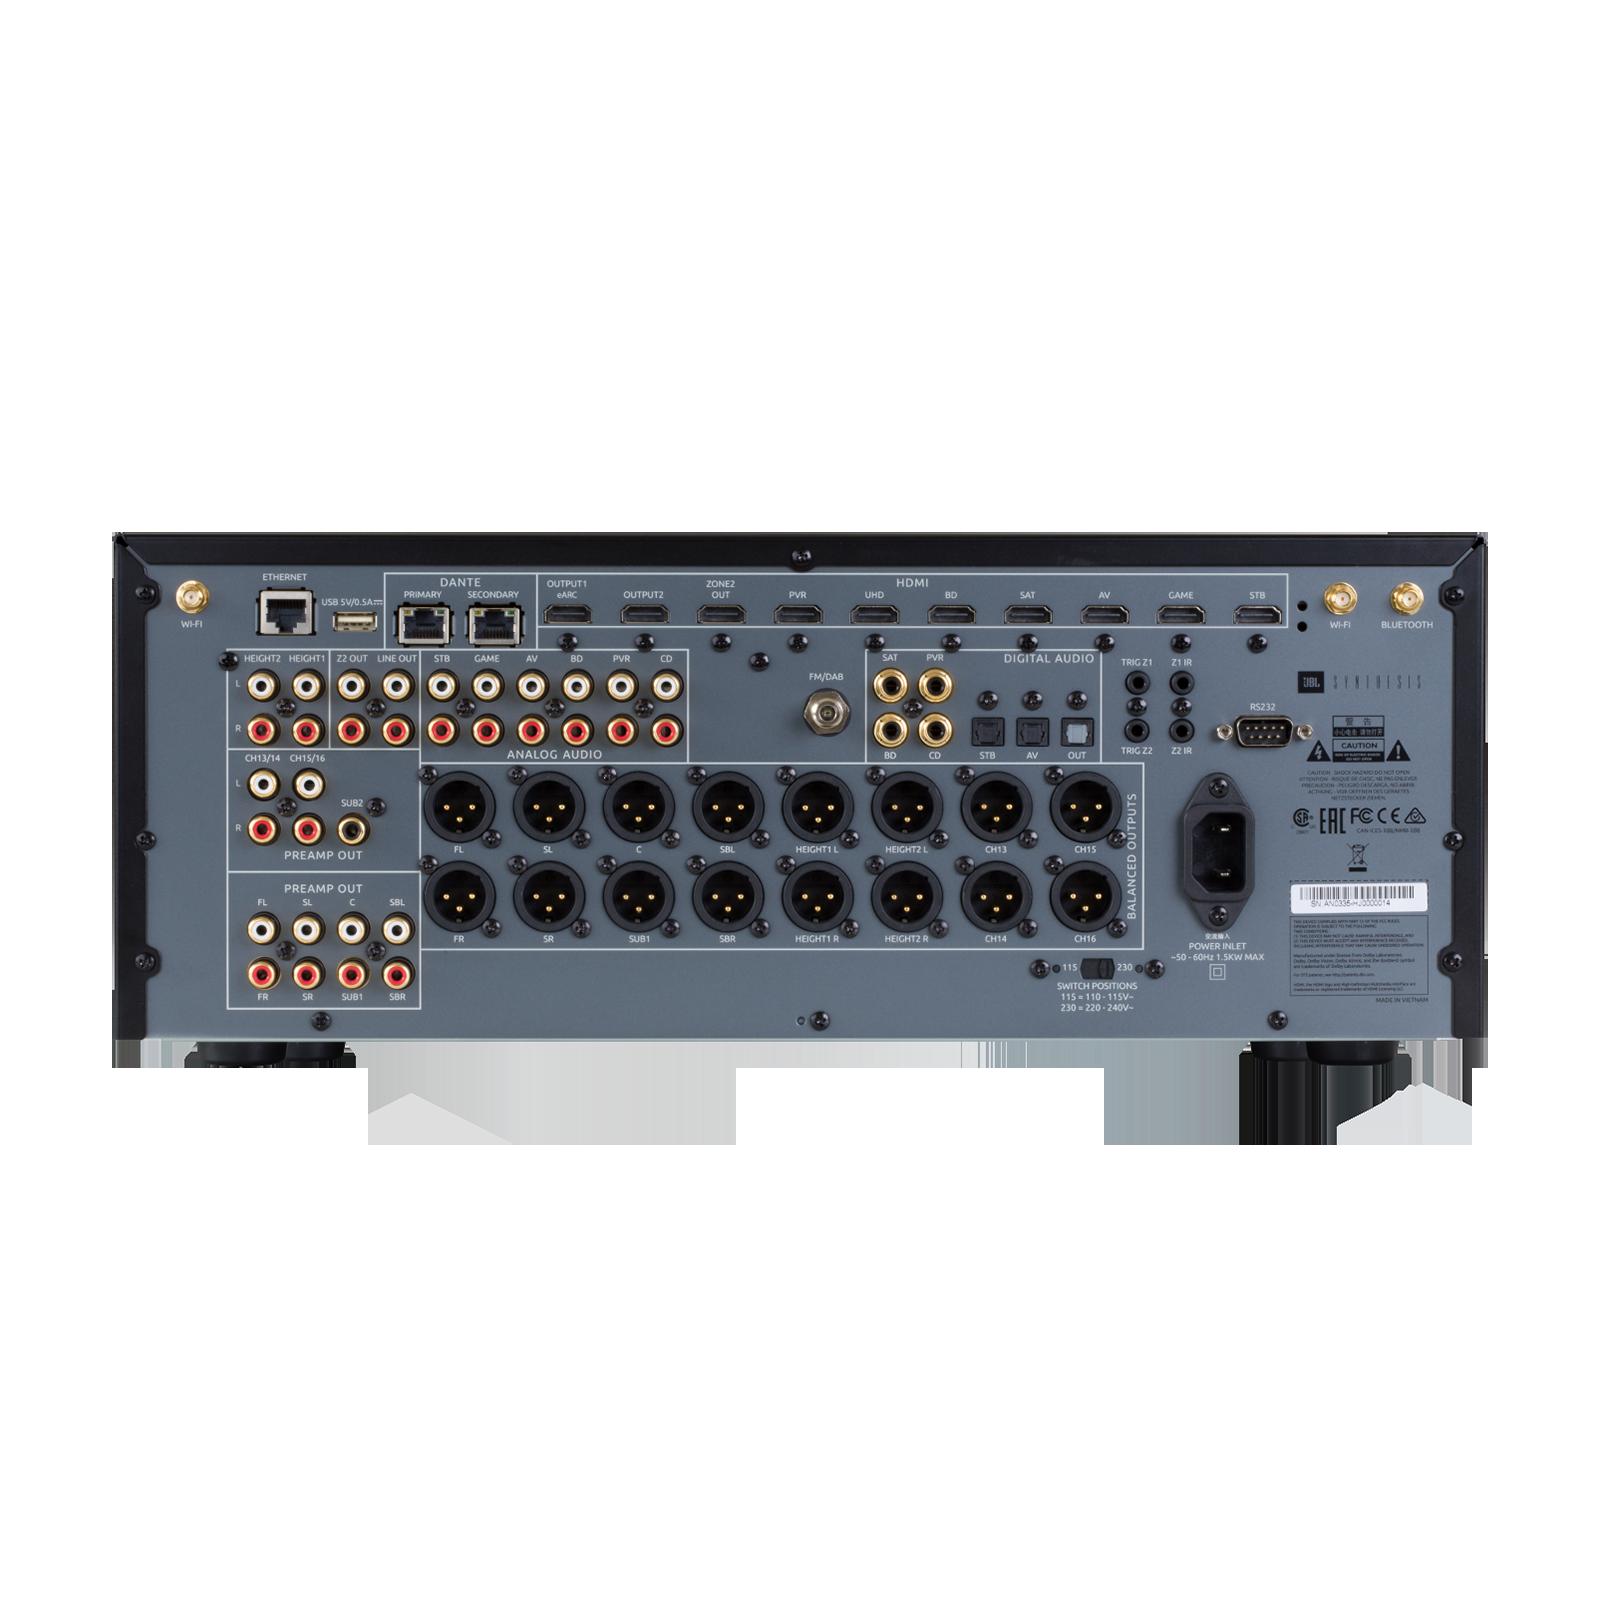 SDP-55 - Black - 16 Ch. Immersive Surround Sound Processor with Dante - Back